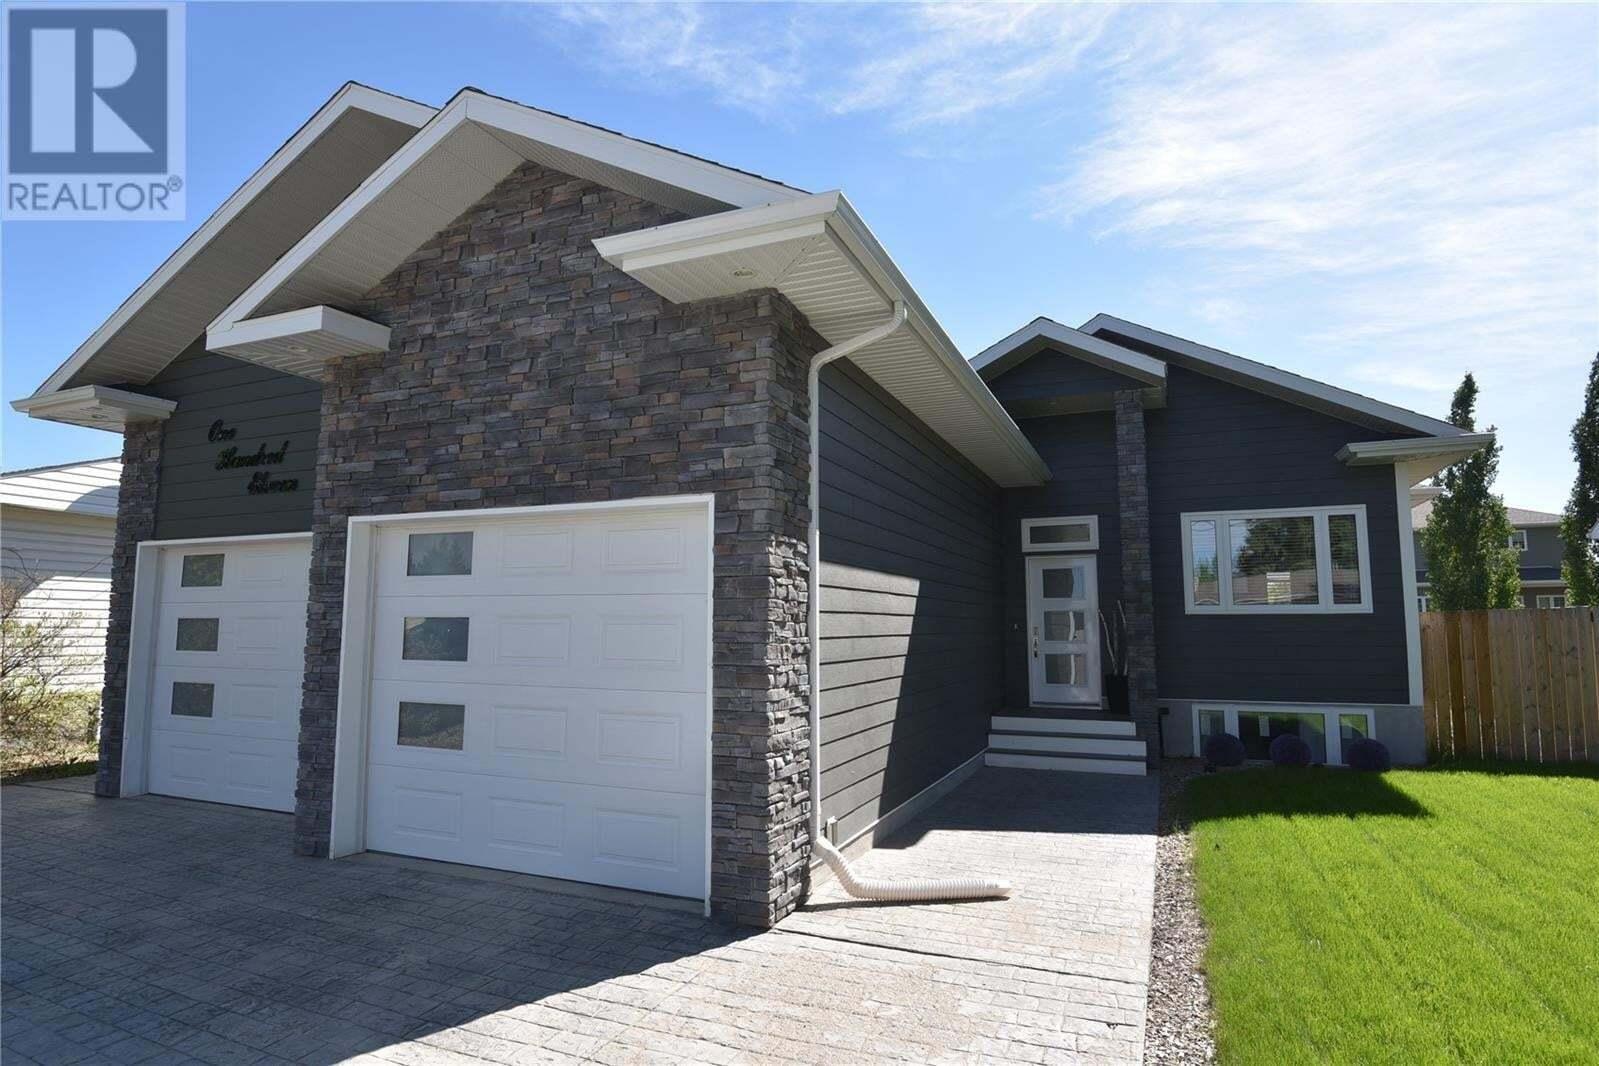 House for sale at 111 6th St E Nipawin Saskatchewan - MLS: SK810557